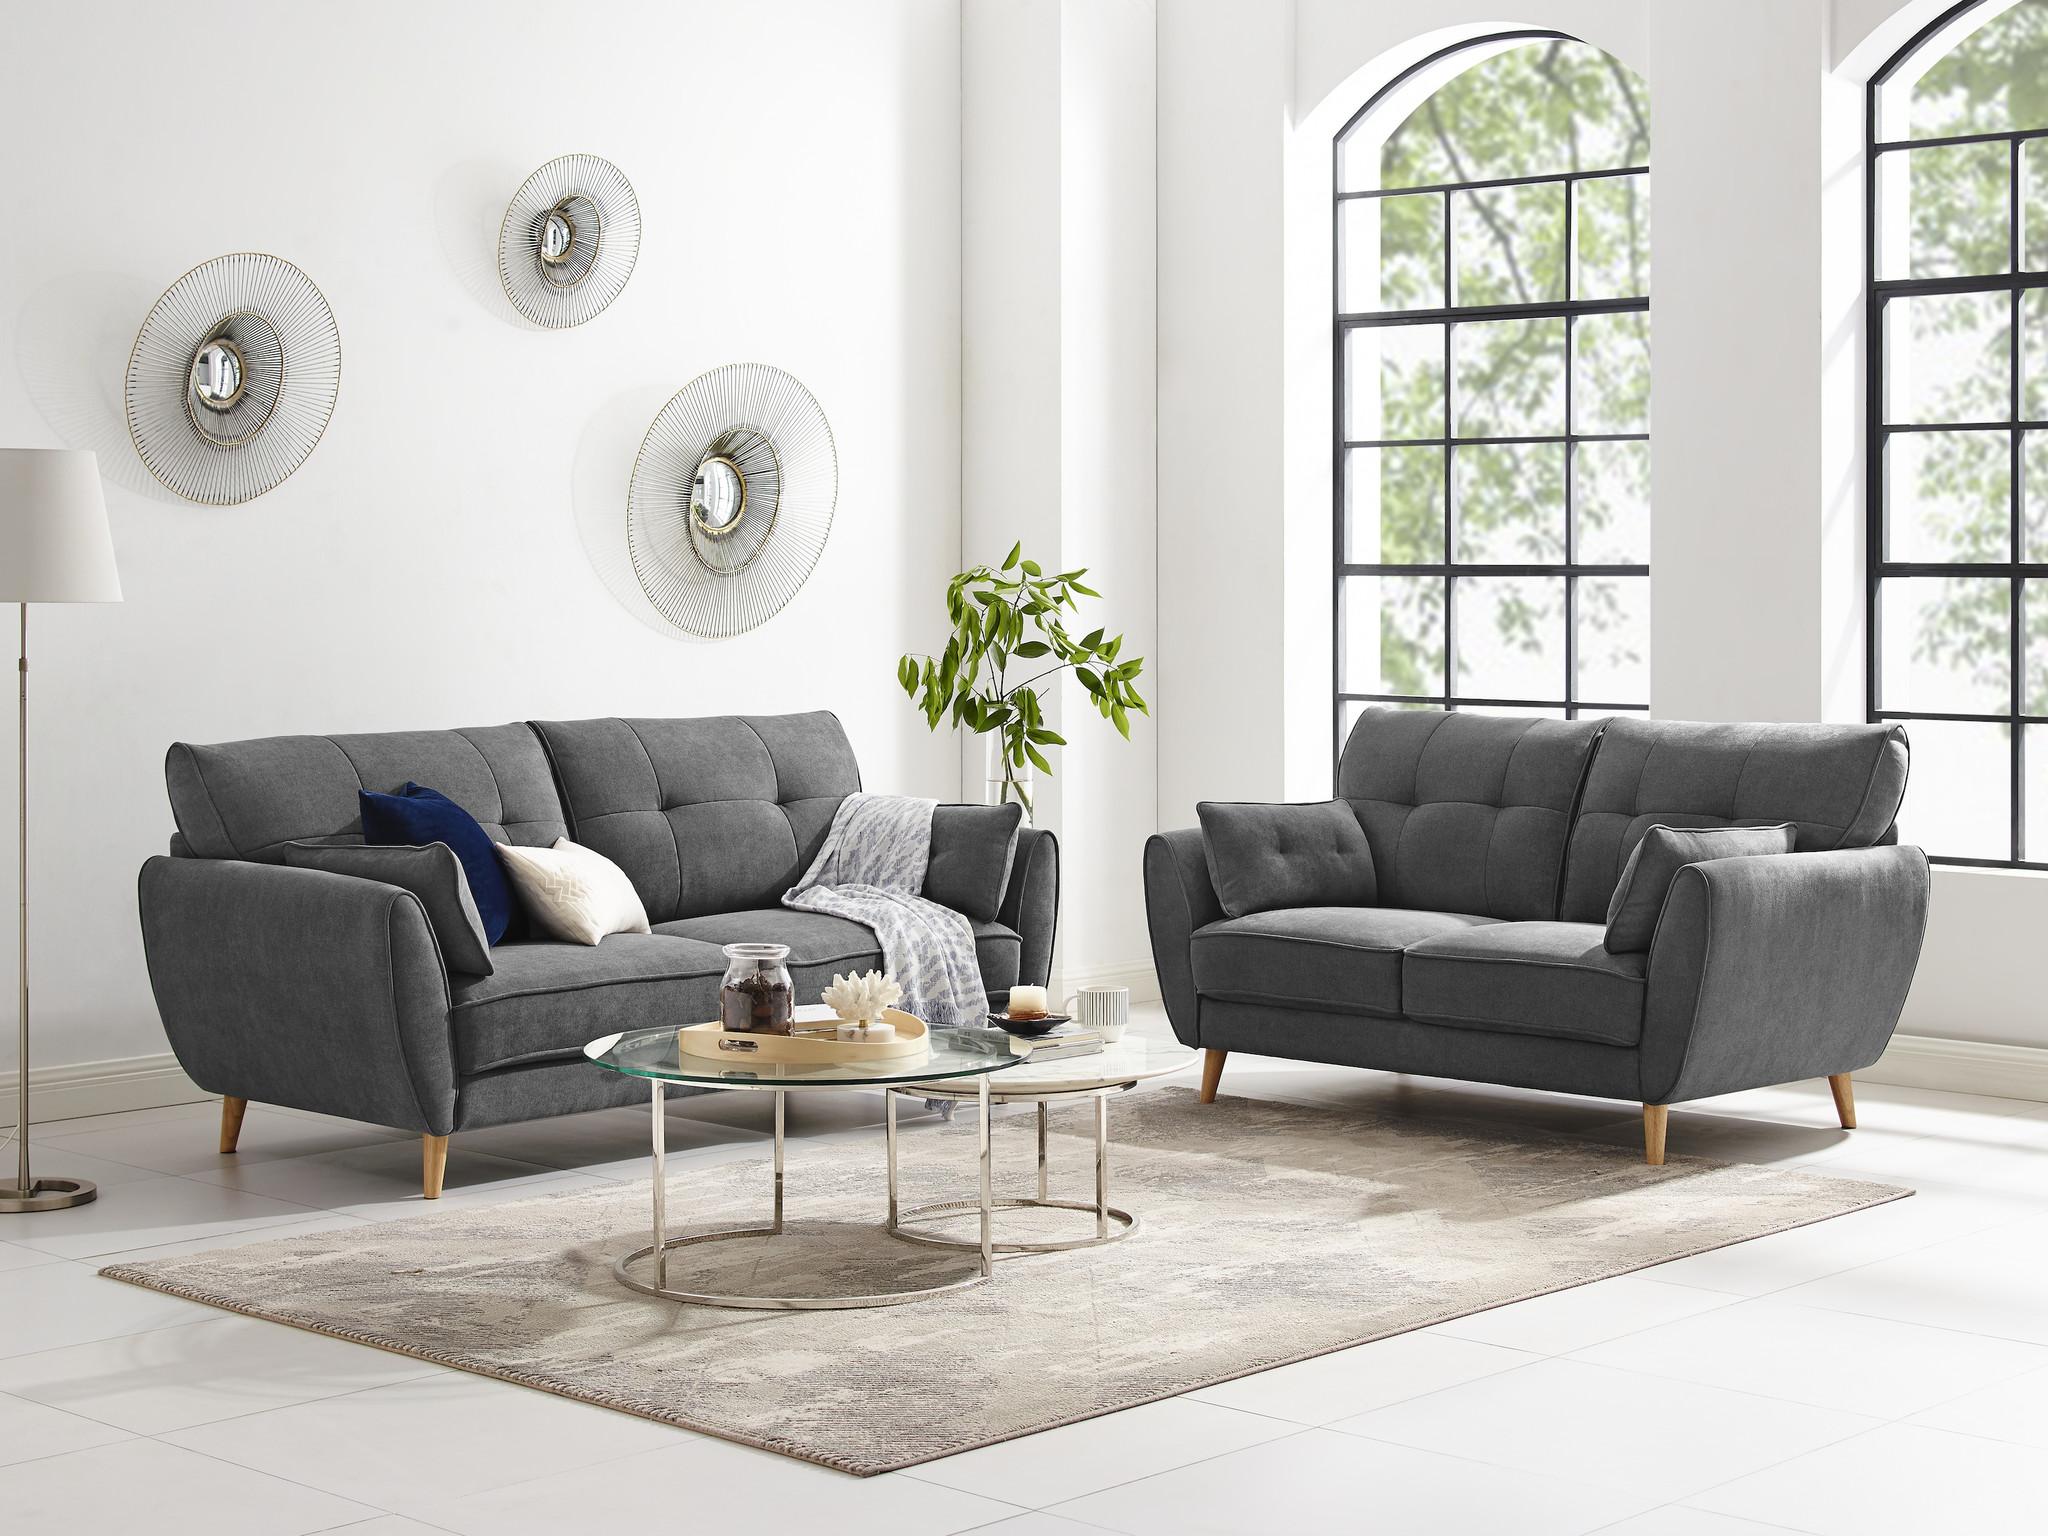 Duverger Pure Scandinavian - Sunny Day - Sofa - 2-zitsbank - grijze stof - houten pootjes